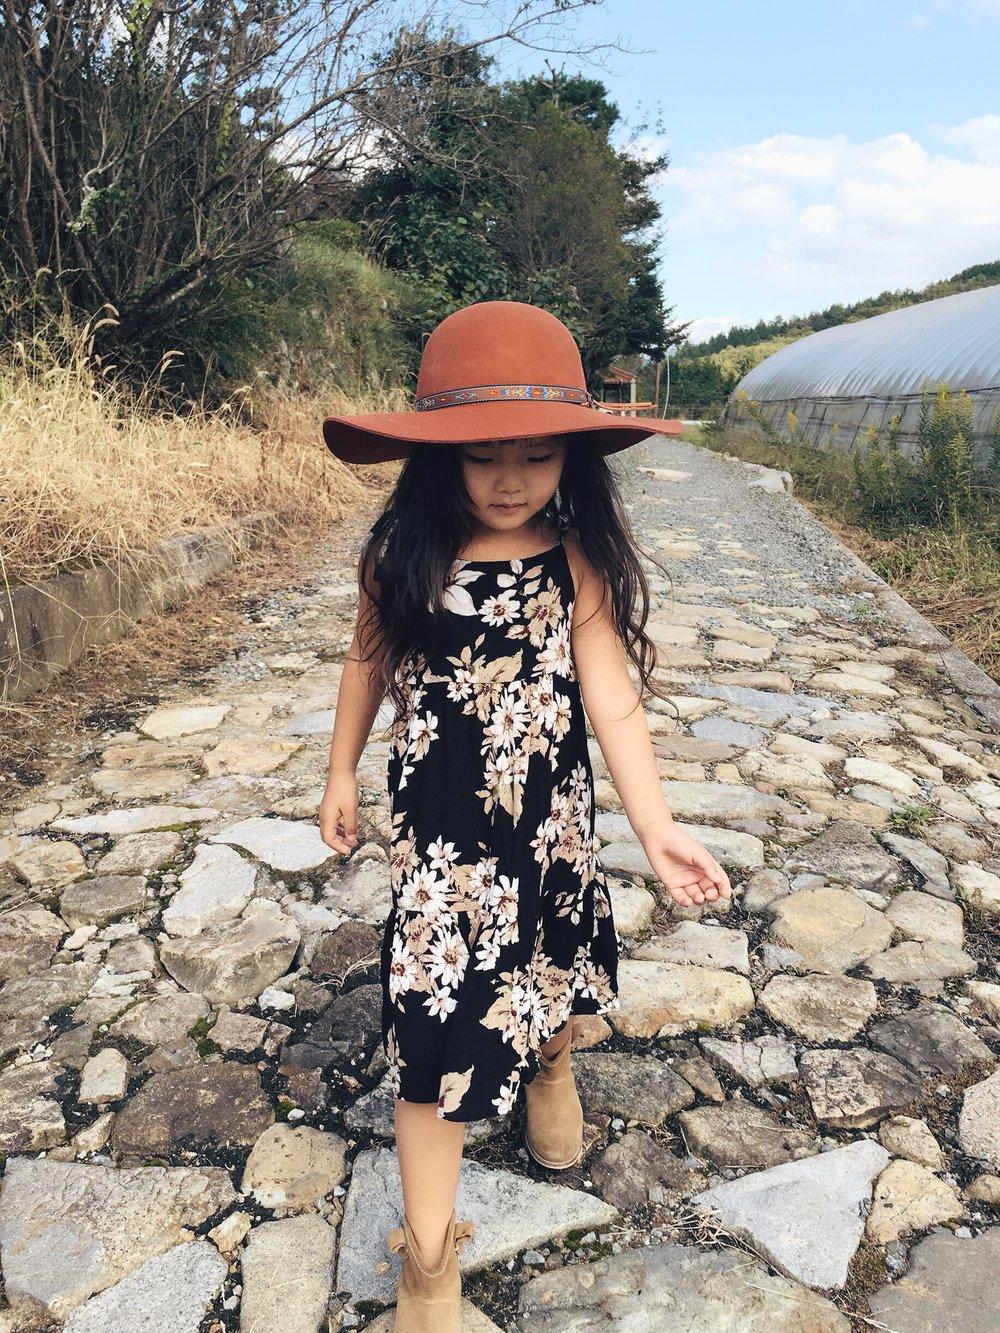 Visited Grandma in the Countryside, HIROSHIMA:Hat: Fallen Broken Street Kids, Dress: Harlow Jade, Boots: Zara Kids